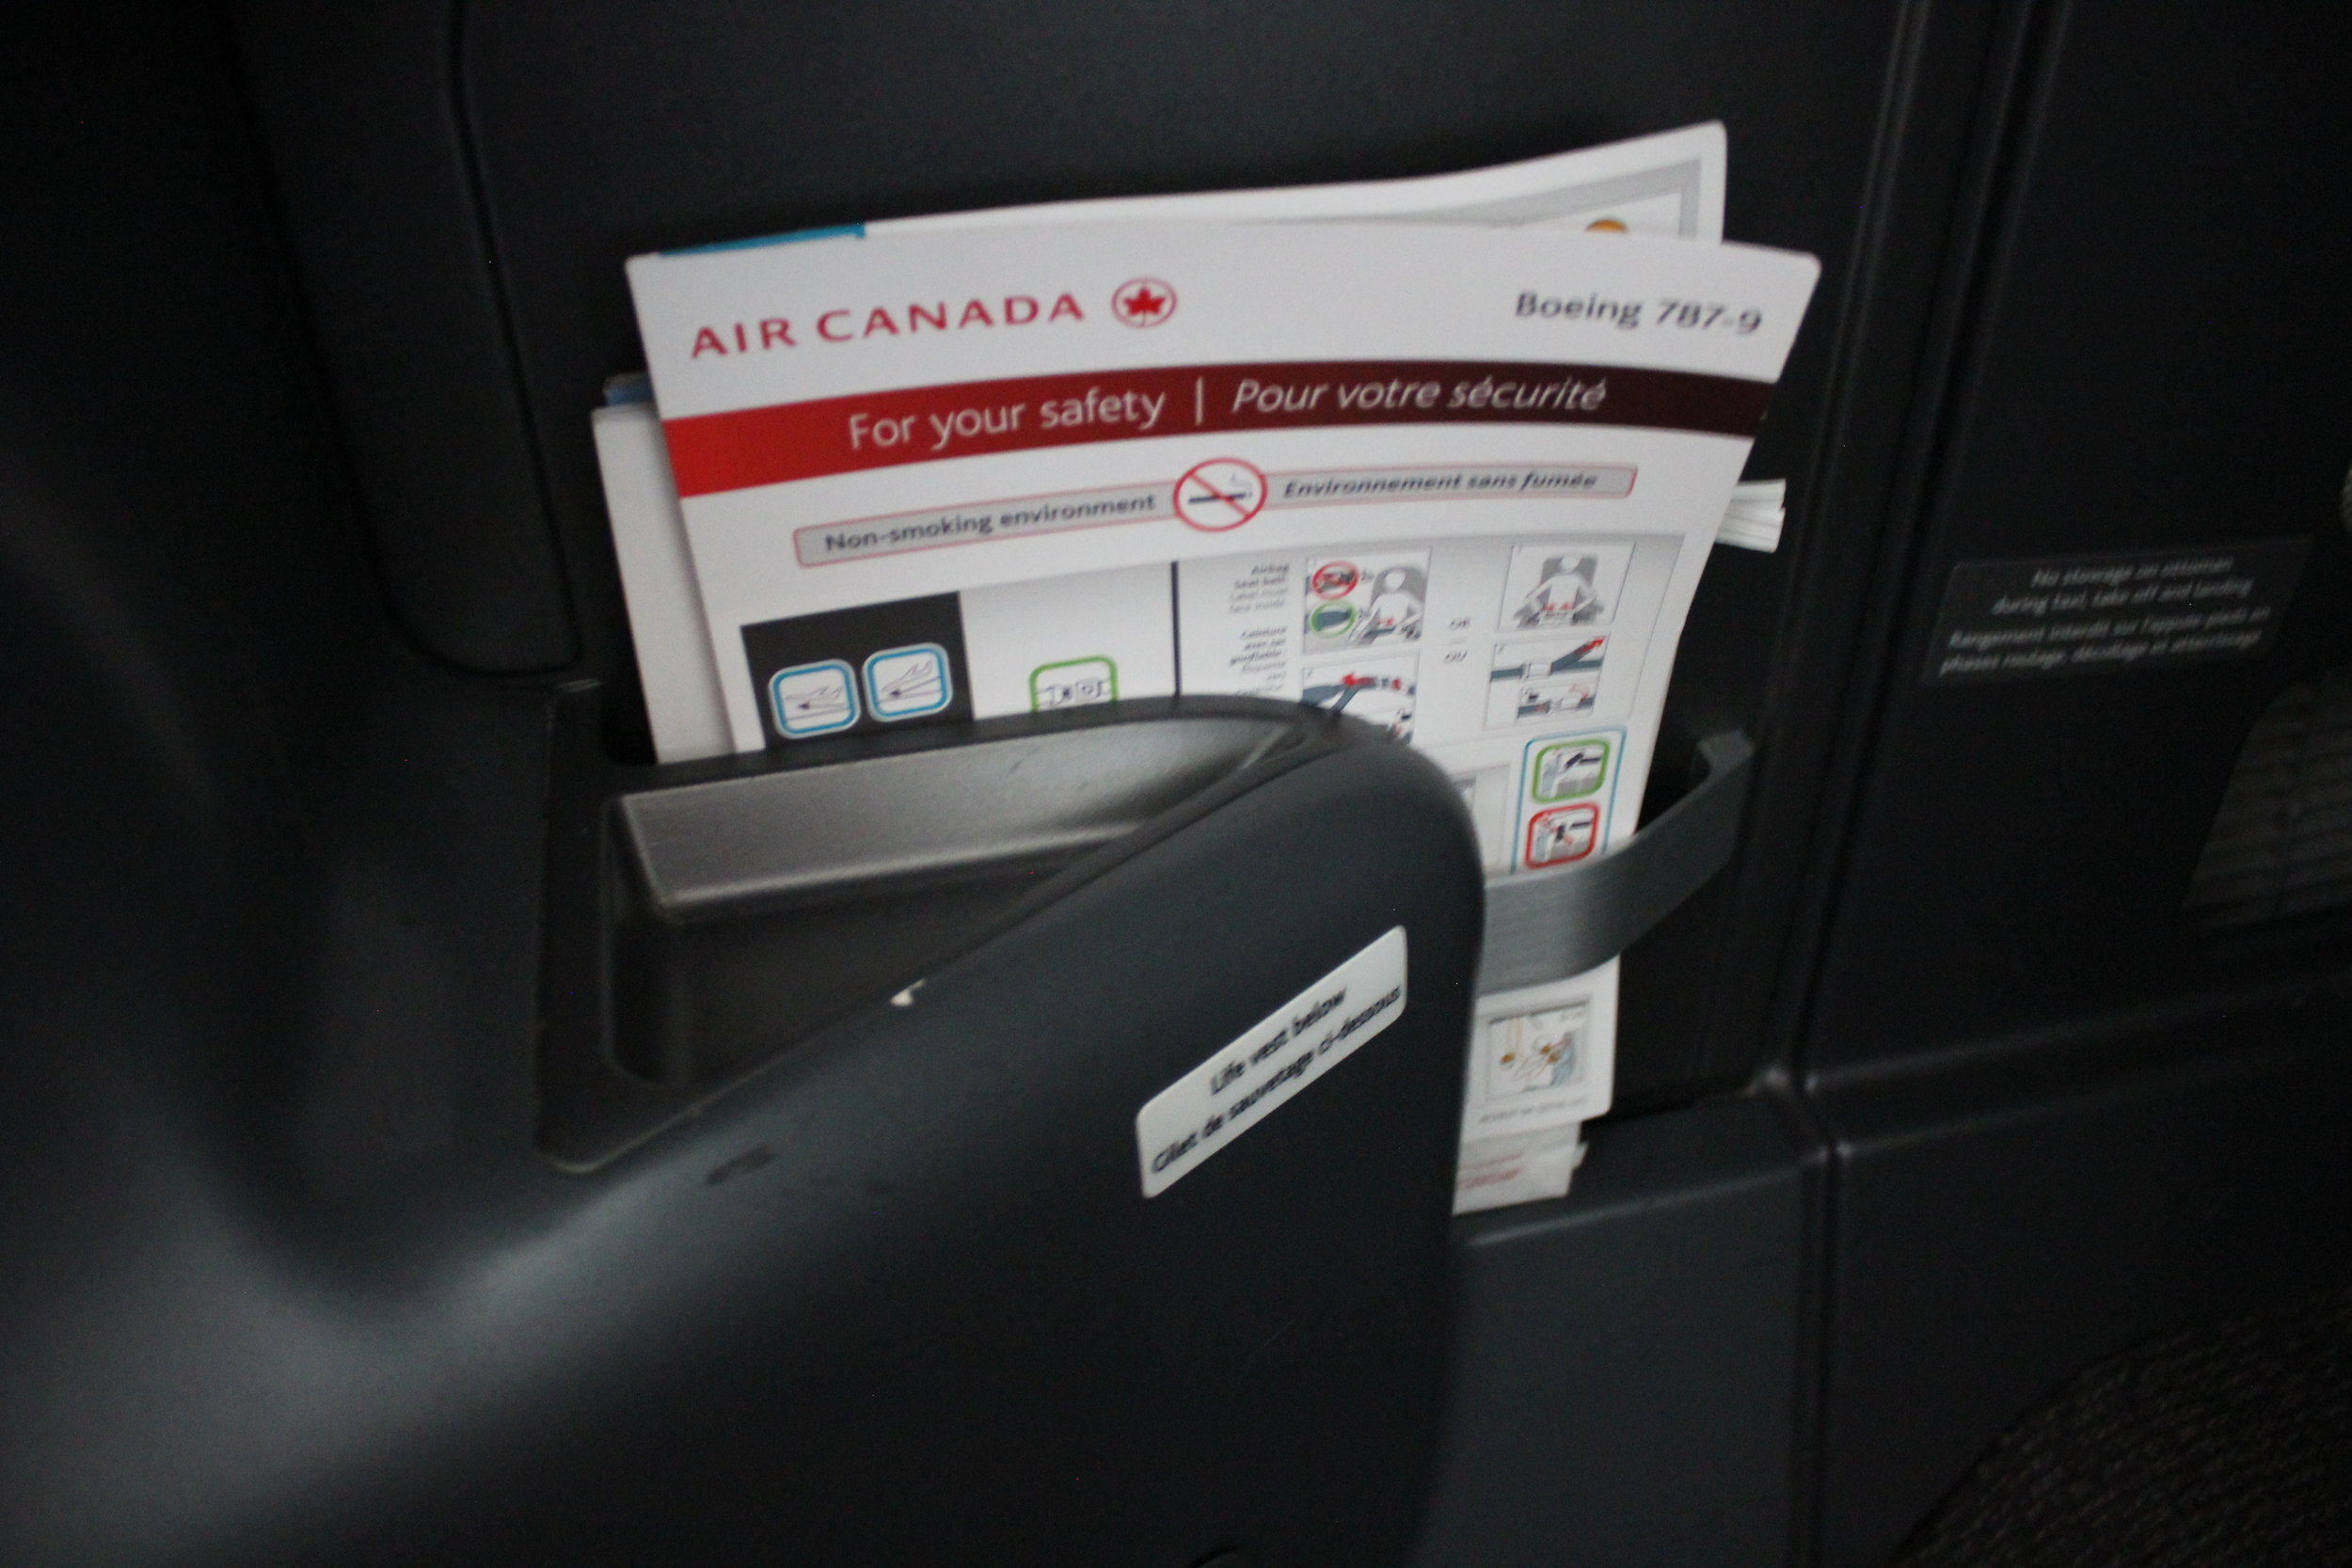 Air Canada business class – Literature pocket